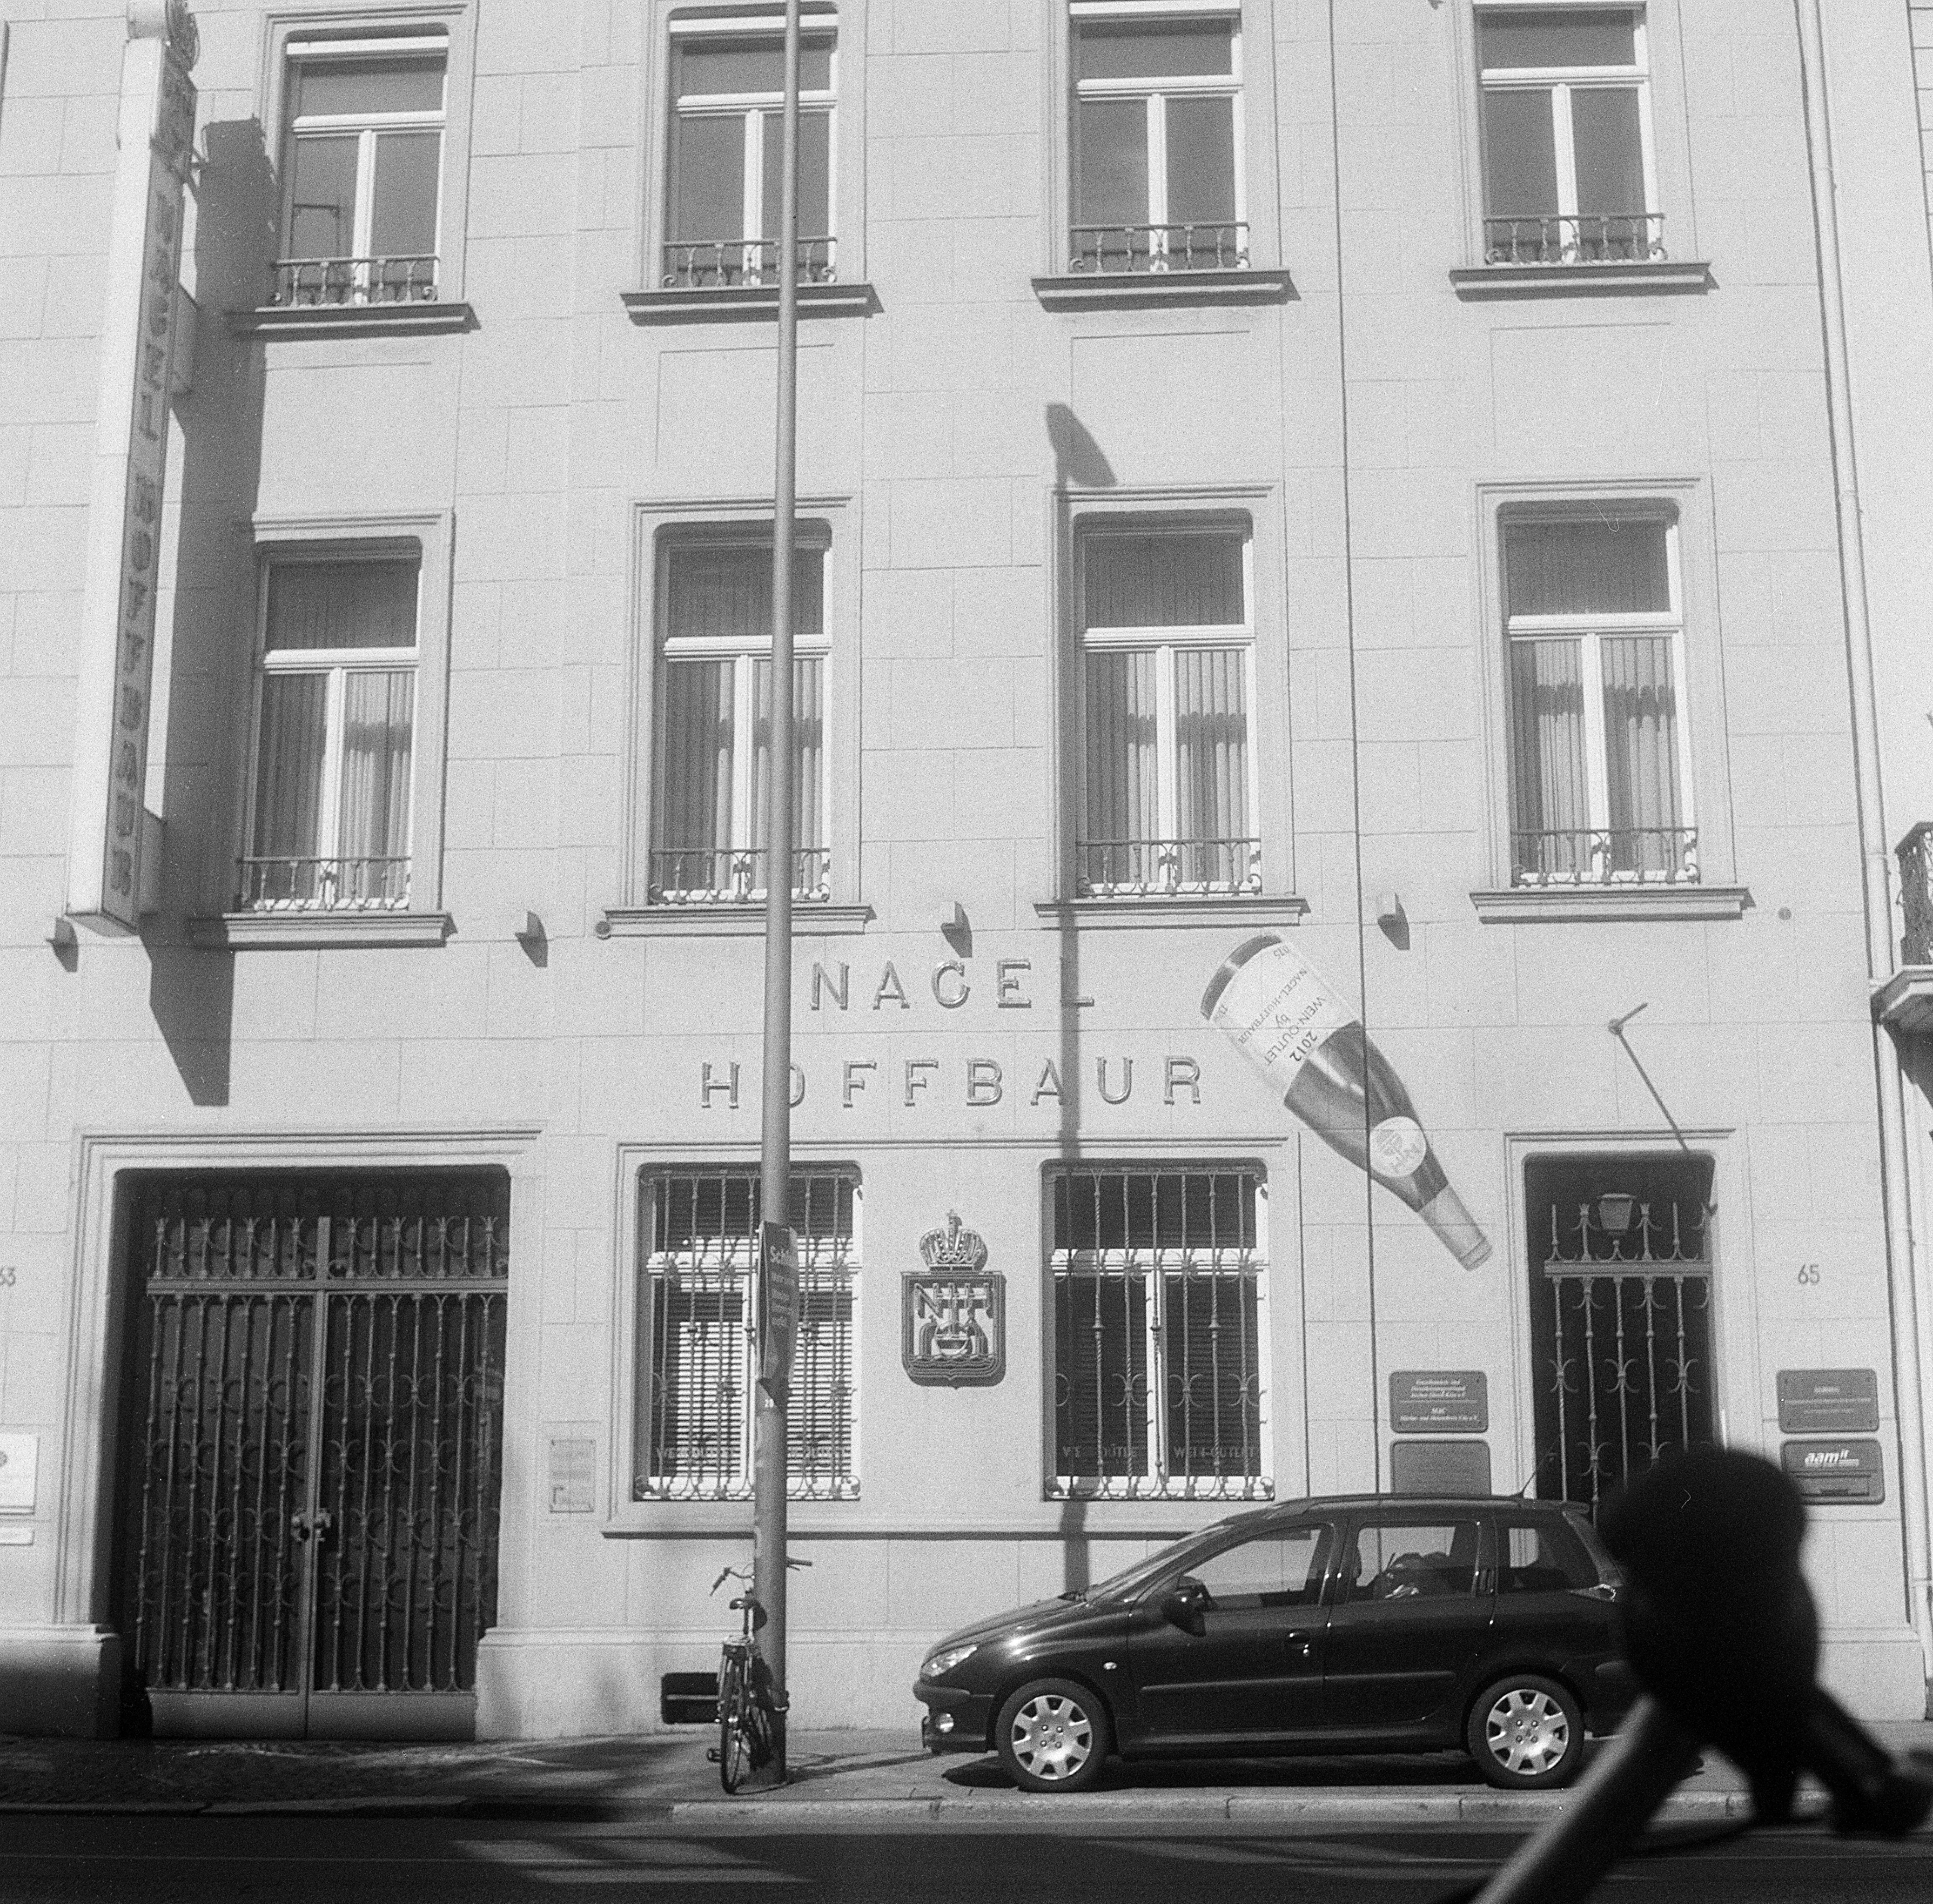 Nagel Hoffbaur Theaterstraße, A - walter_ac | ello